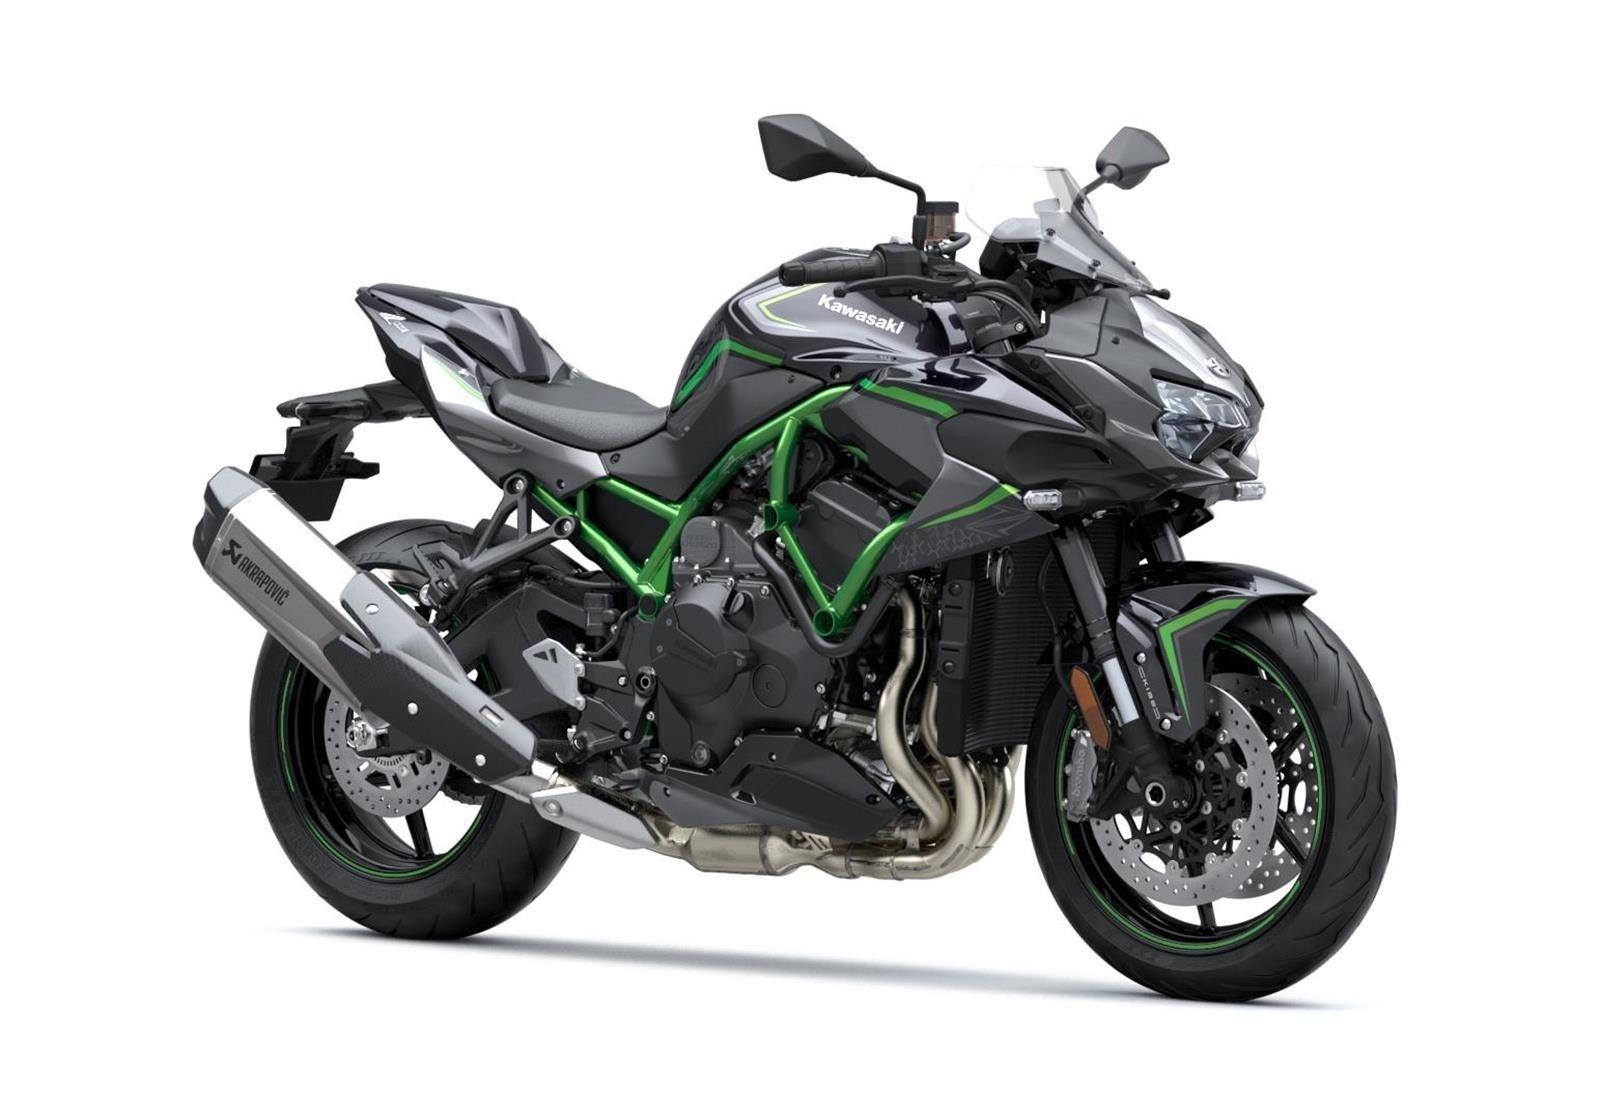 New 2020 Kawasaki Z H2 Naked Supercharged Roadster Z1000